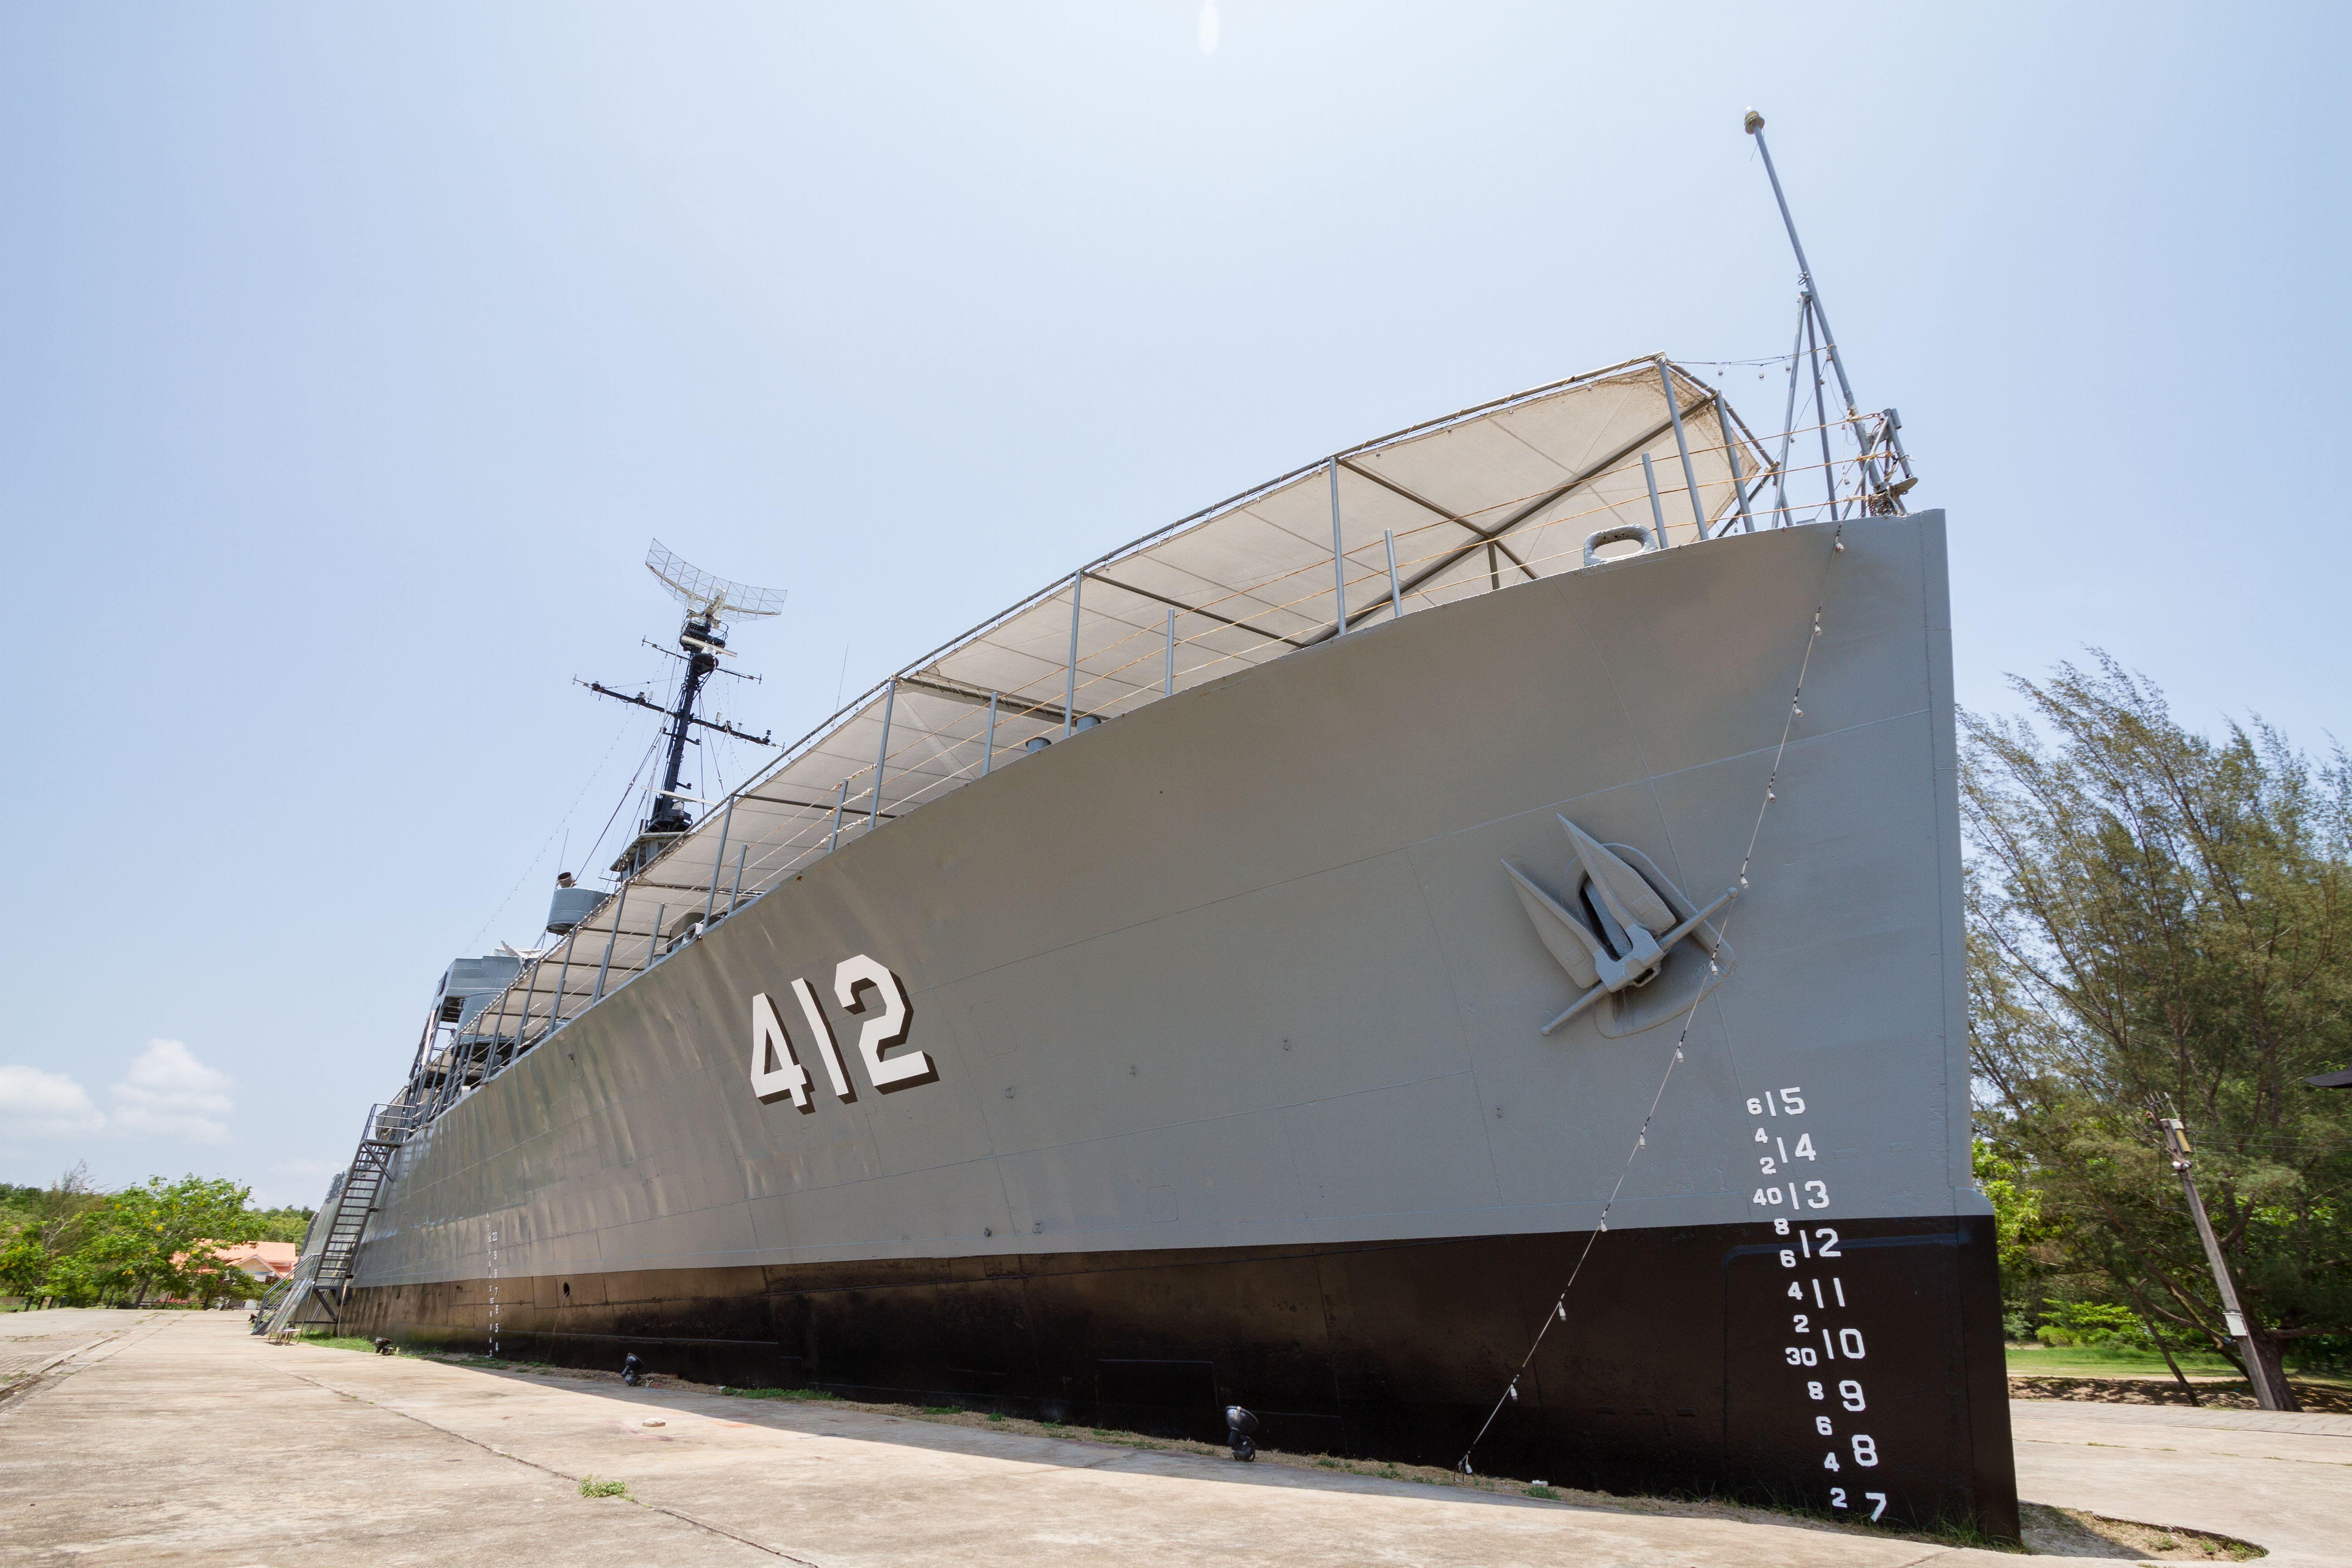 HTMS Prasae warship display in Rayong, Thailand